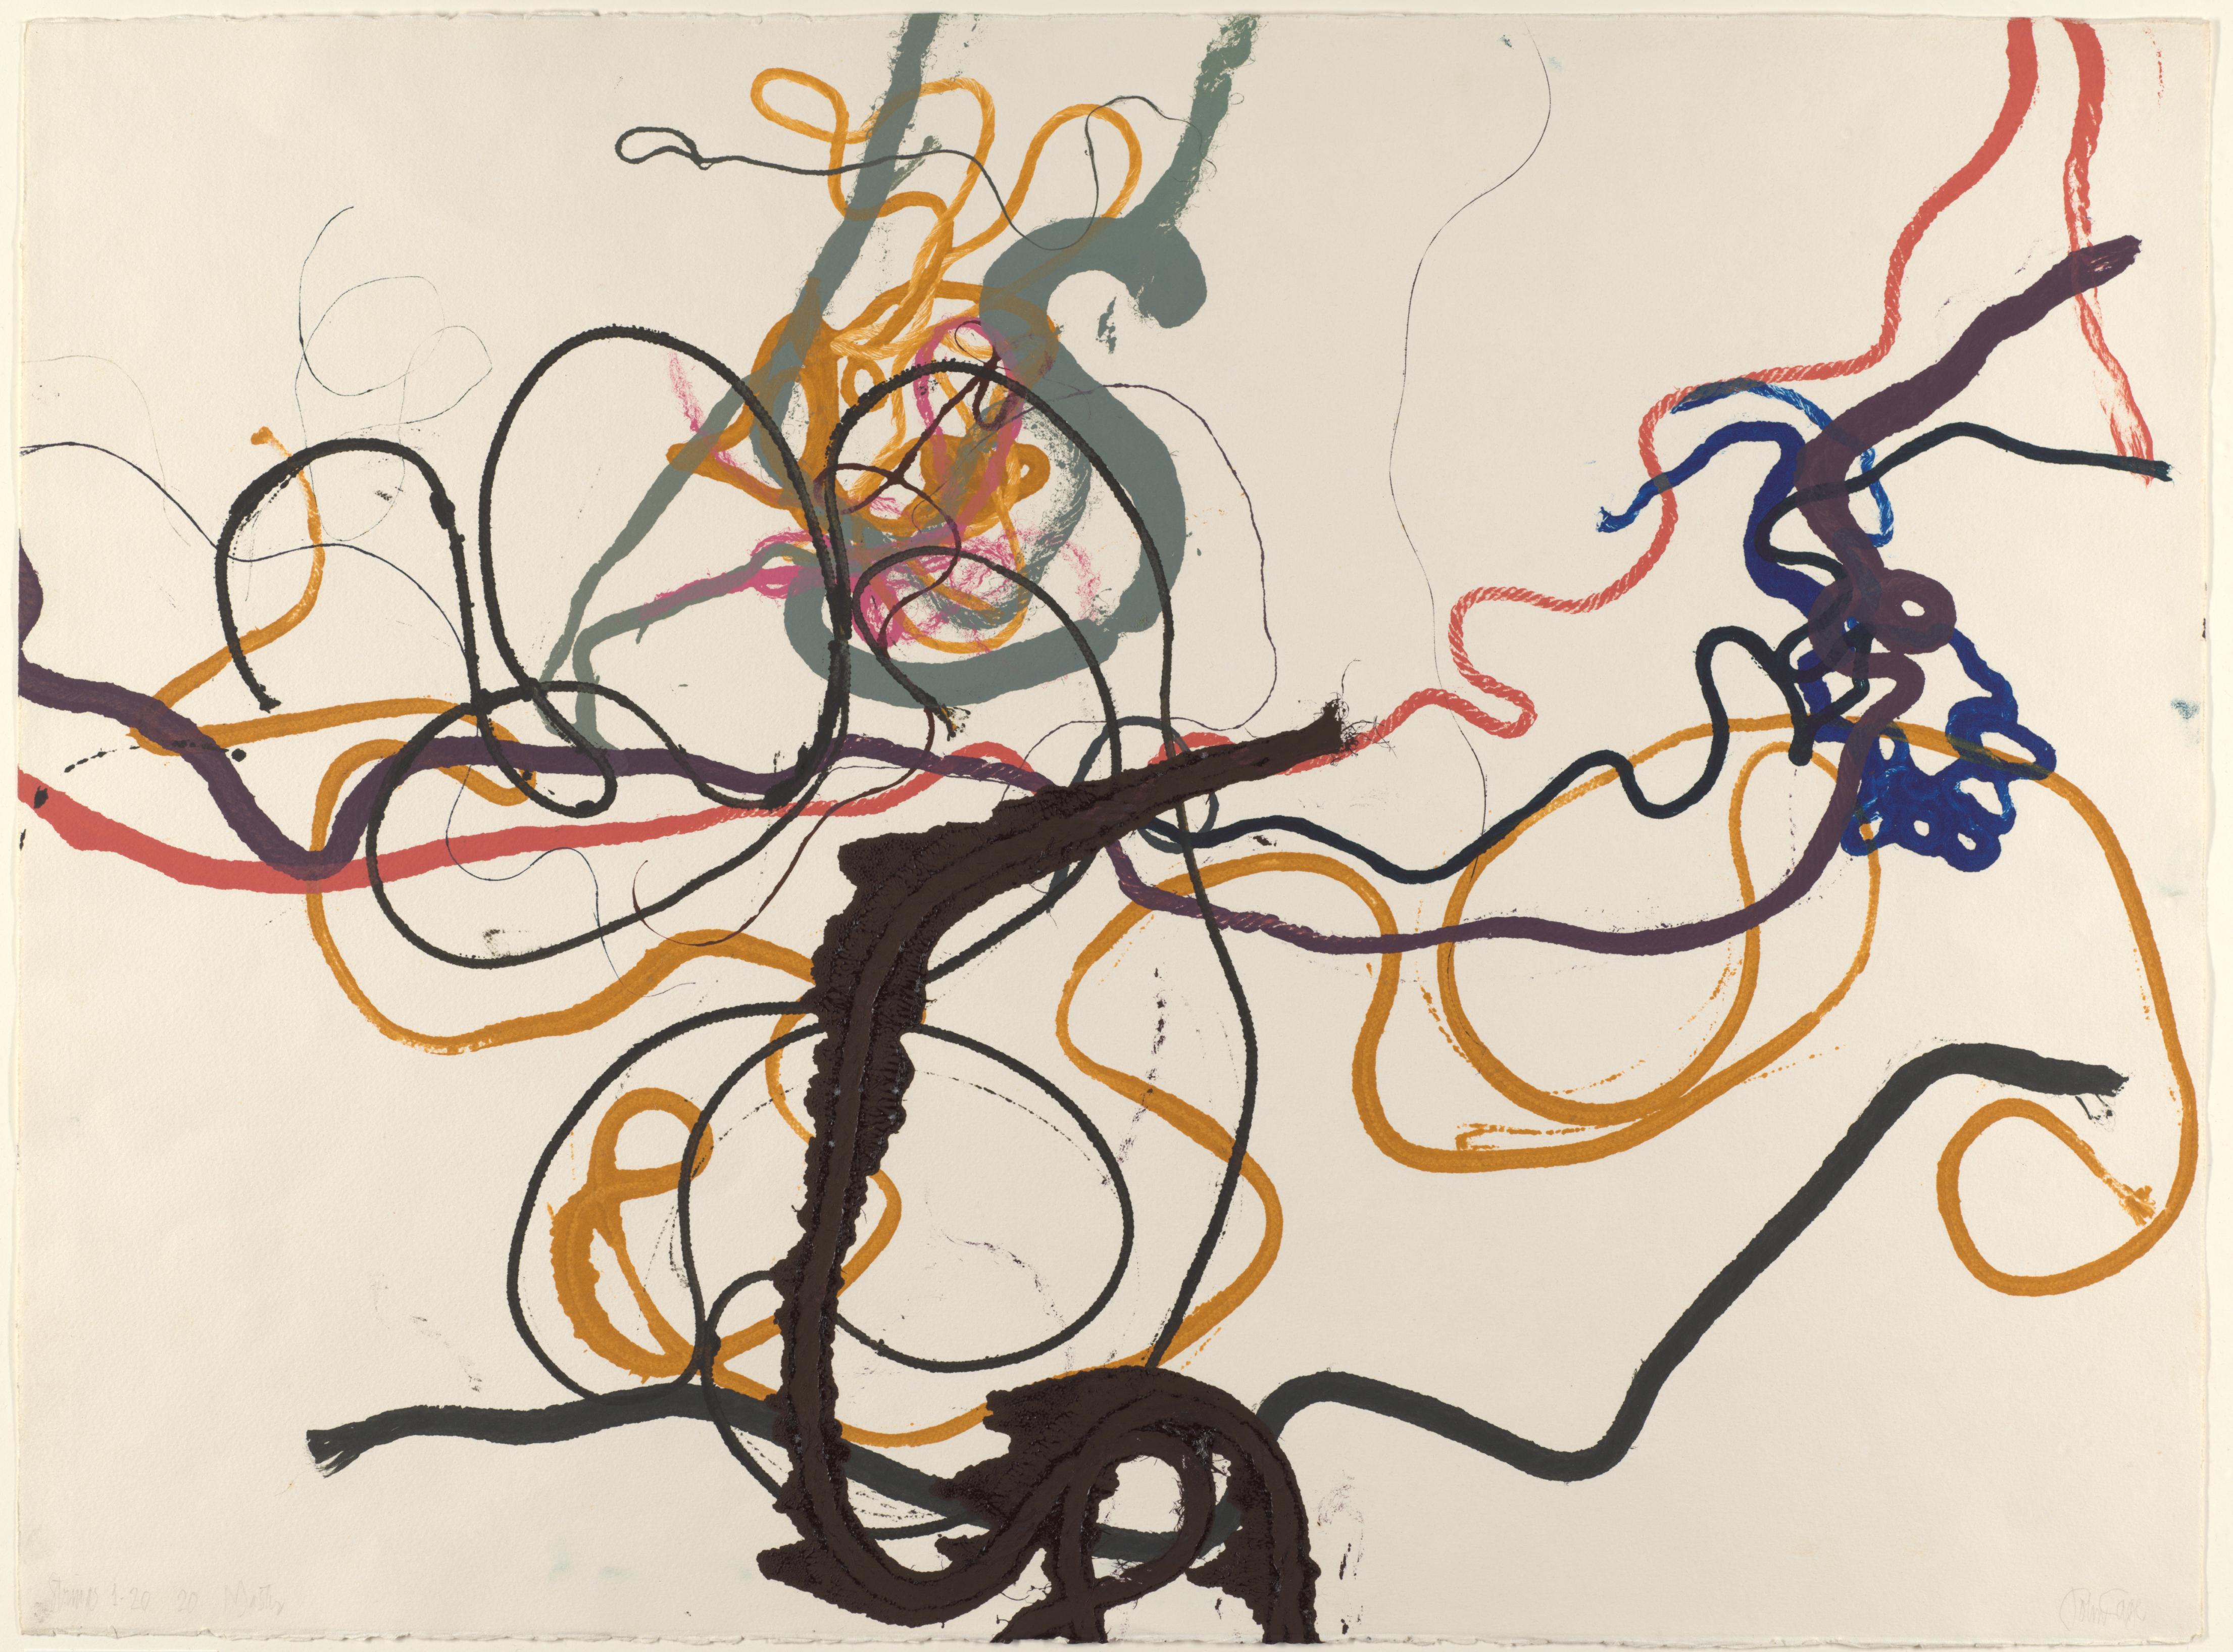 John Cage Strings 1-20, 1980